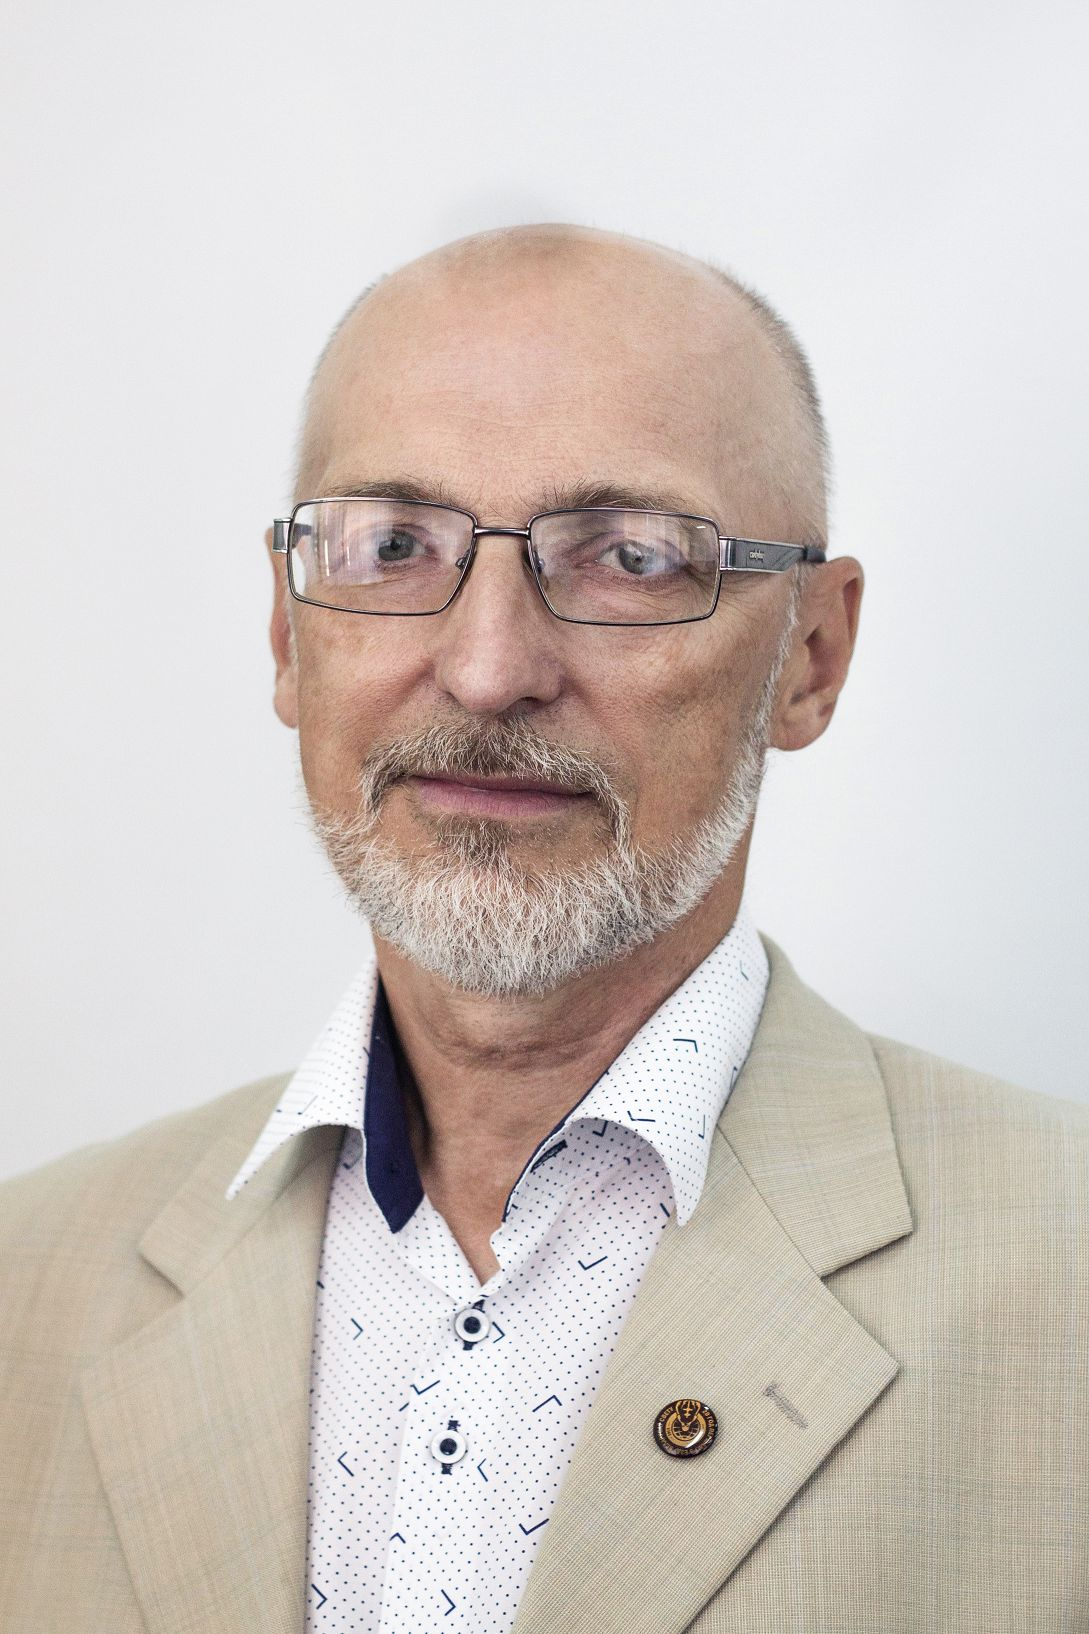 Агееў Аляксандр Рыгоравіч